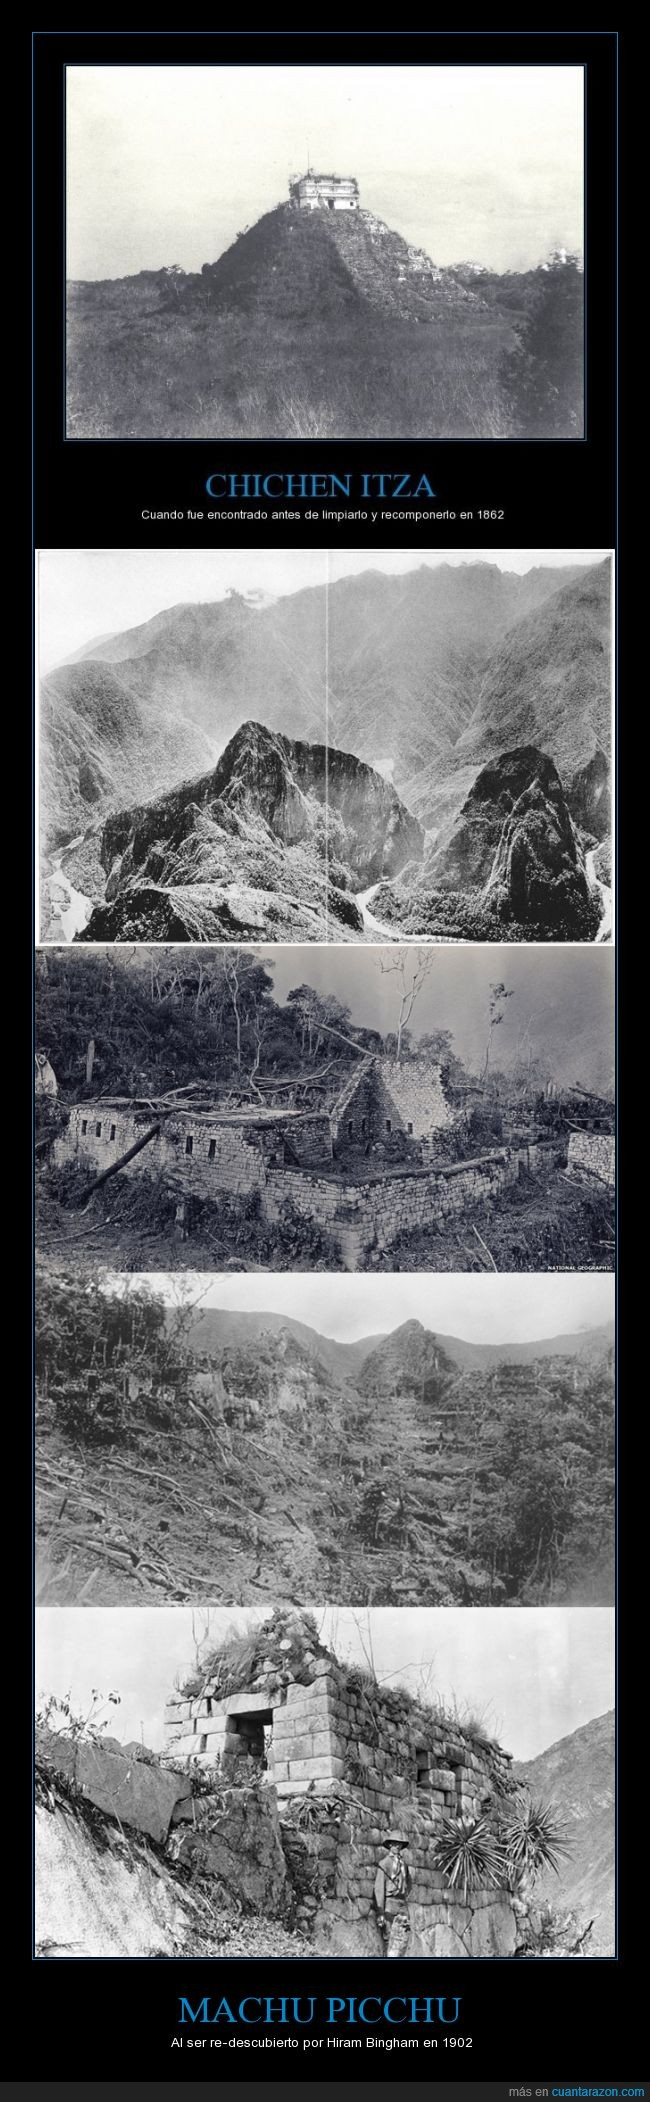 Hiram Bingham,Machu Picchu,Maravilla del Mundo,Patrimonio de la Humanidad,Peru